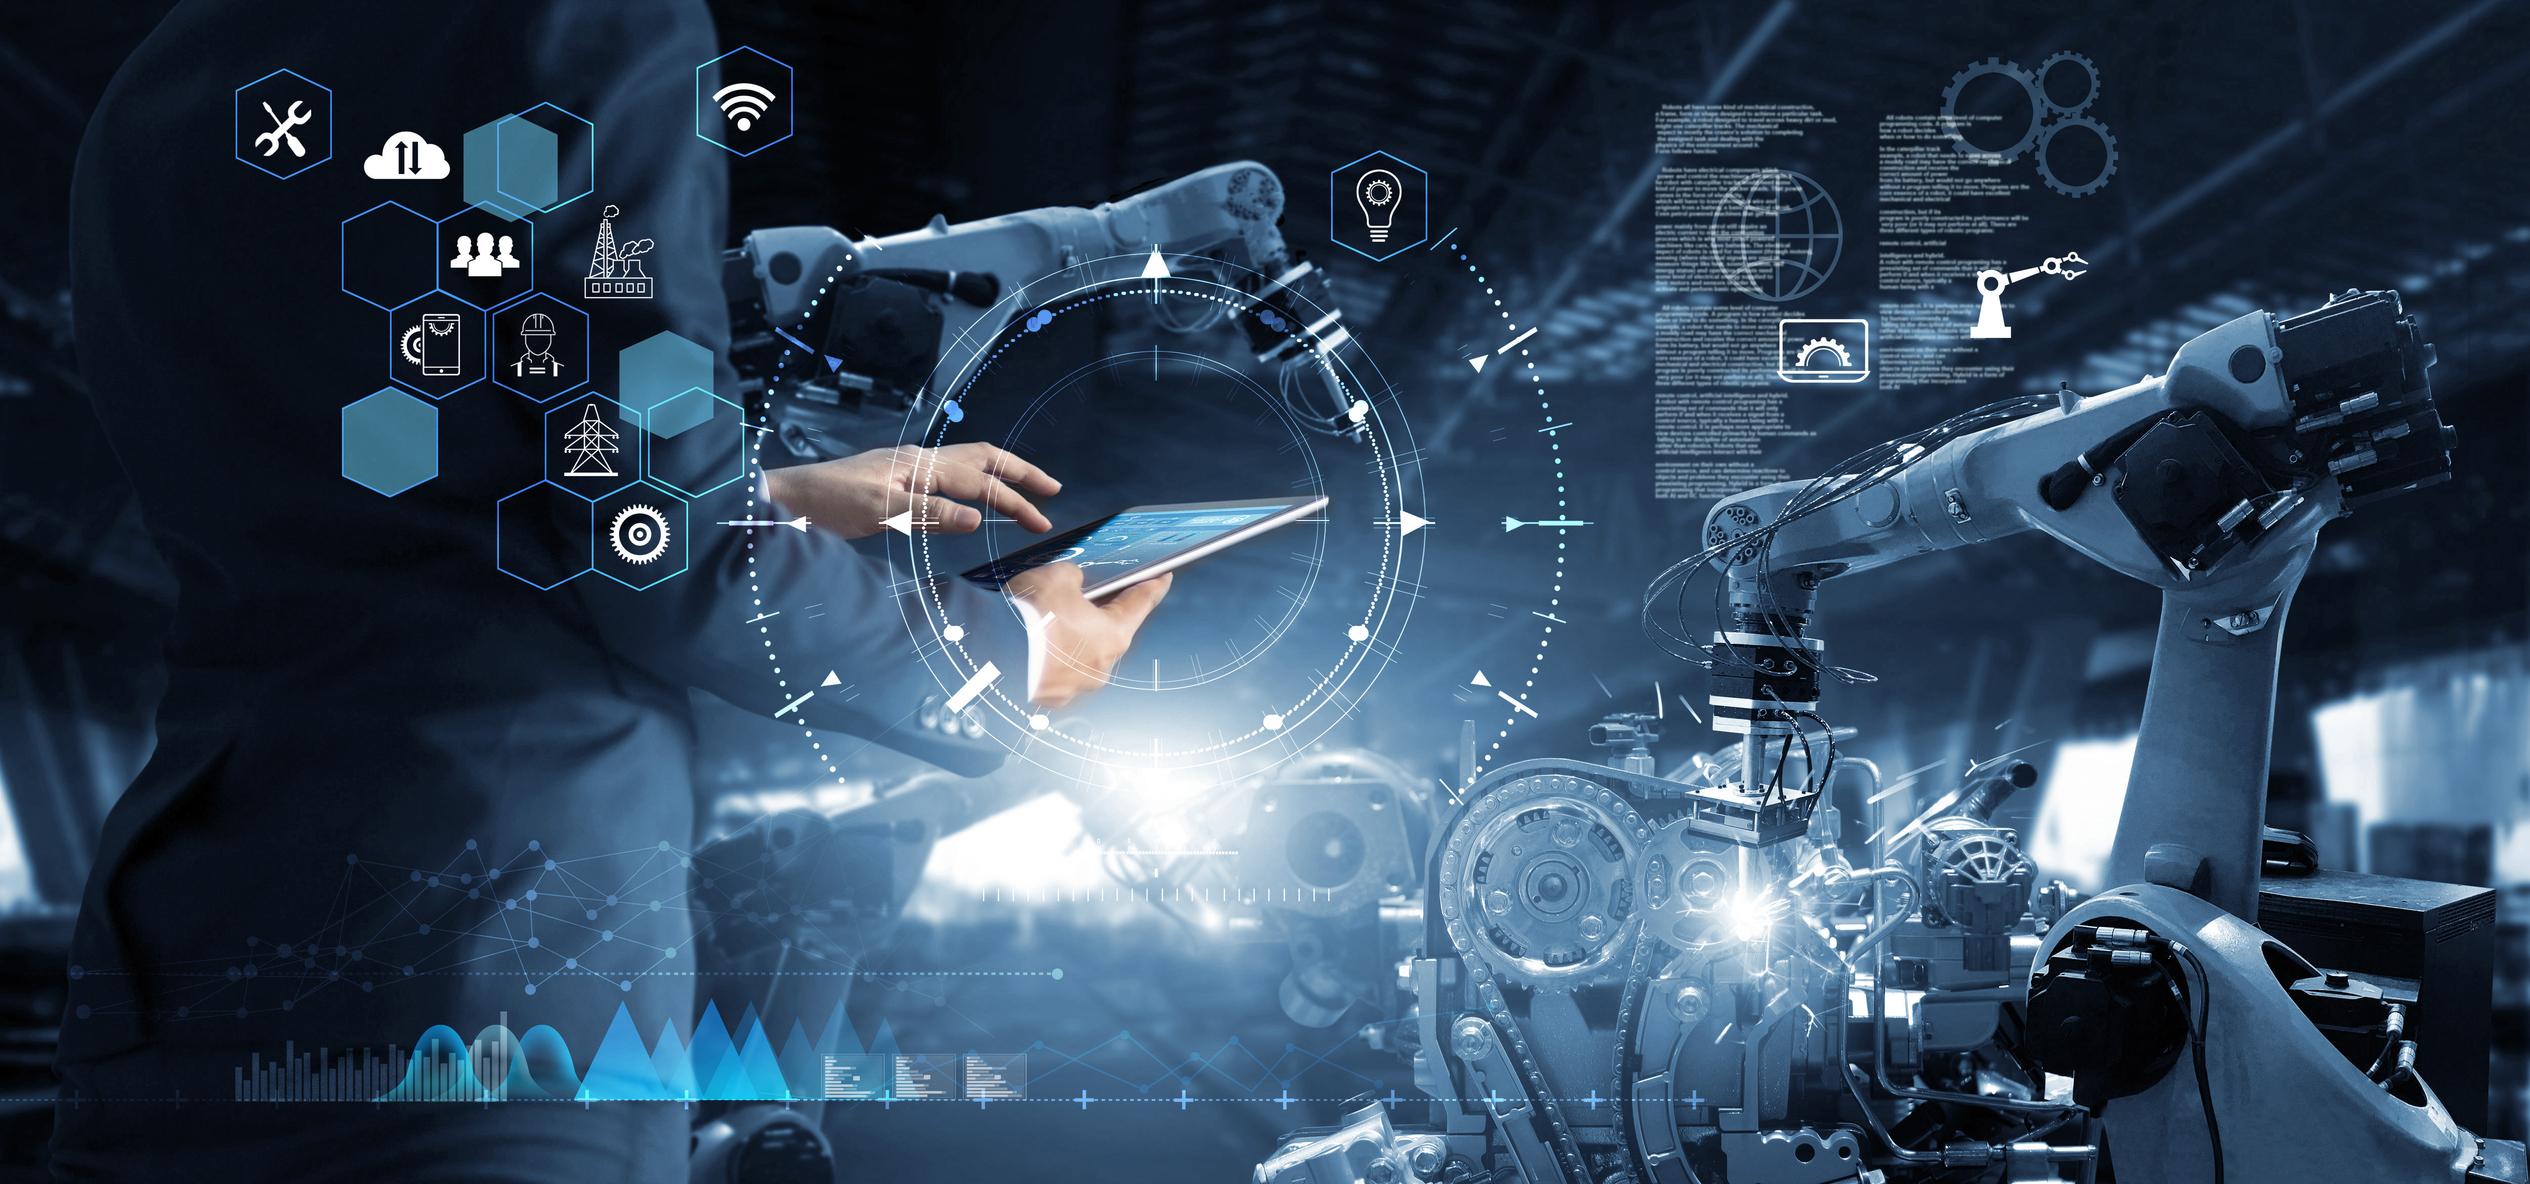 The 10 Biggest Robotics Stocks | The Motley Fool